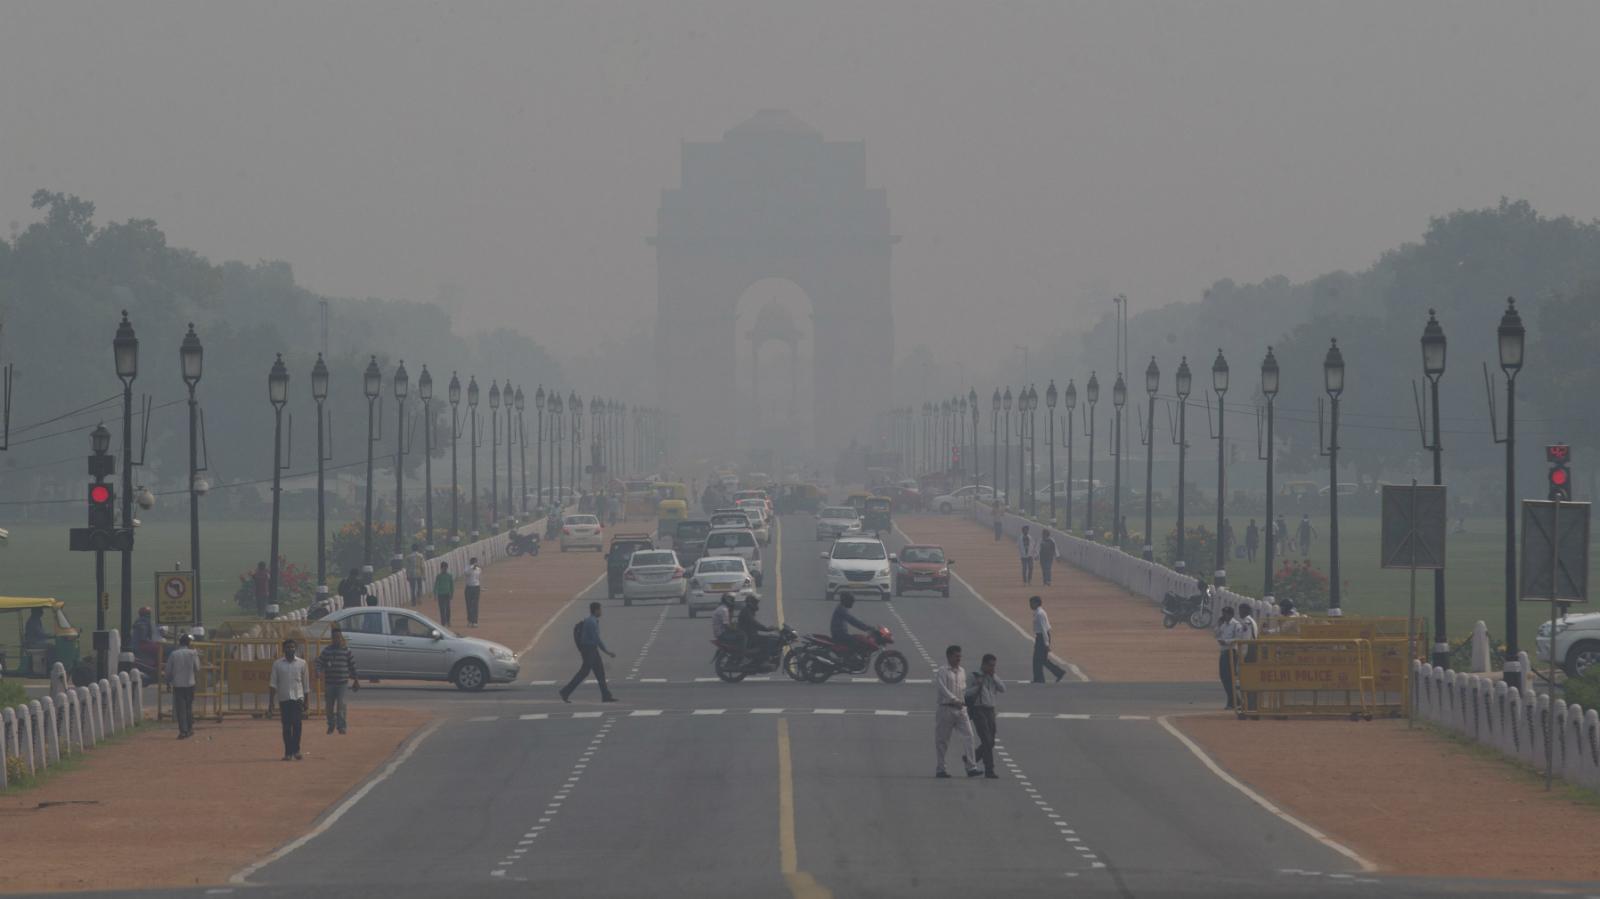 India-Pollution-Environment-New Delhi-Congestion